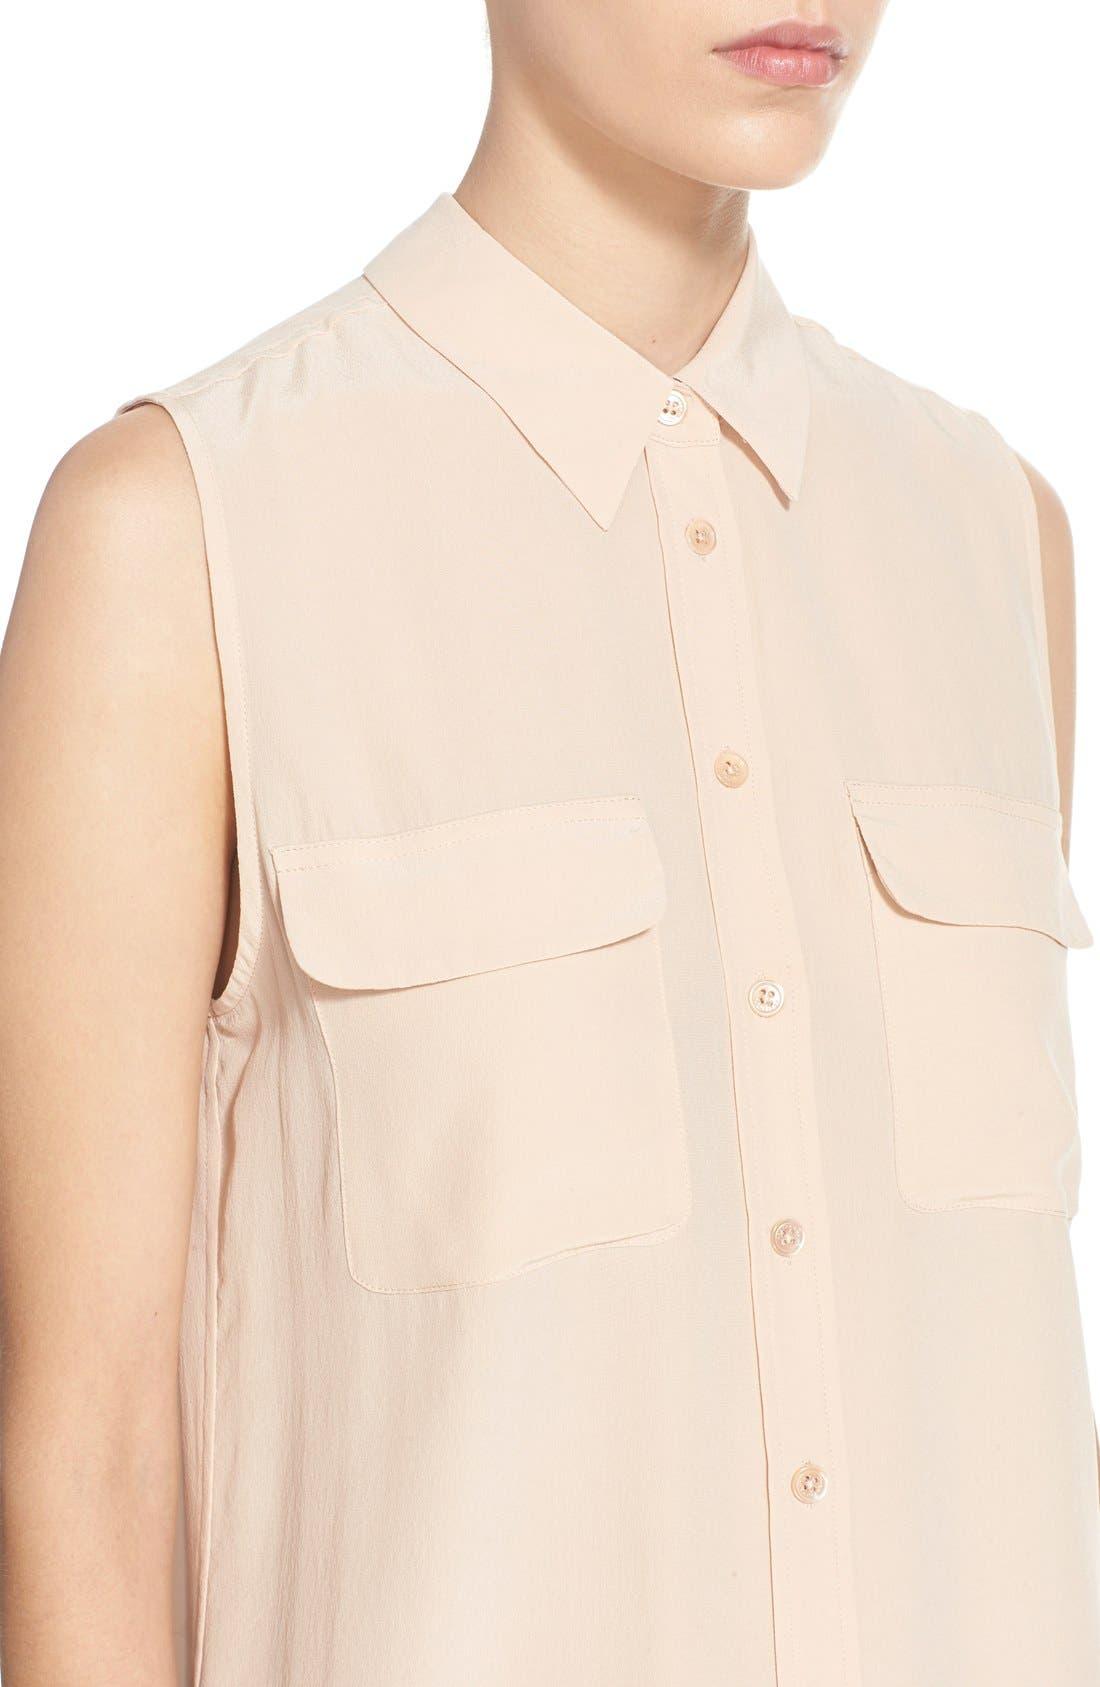 'Slim Signature' Sleeveless Silk Shirt,                             Alternate thumbnail 151, color,